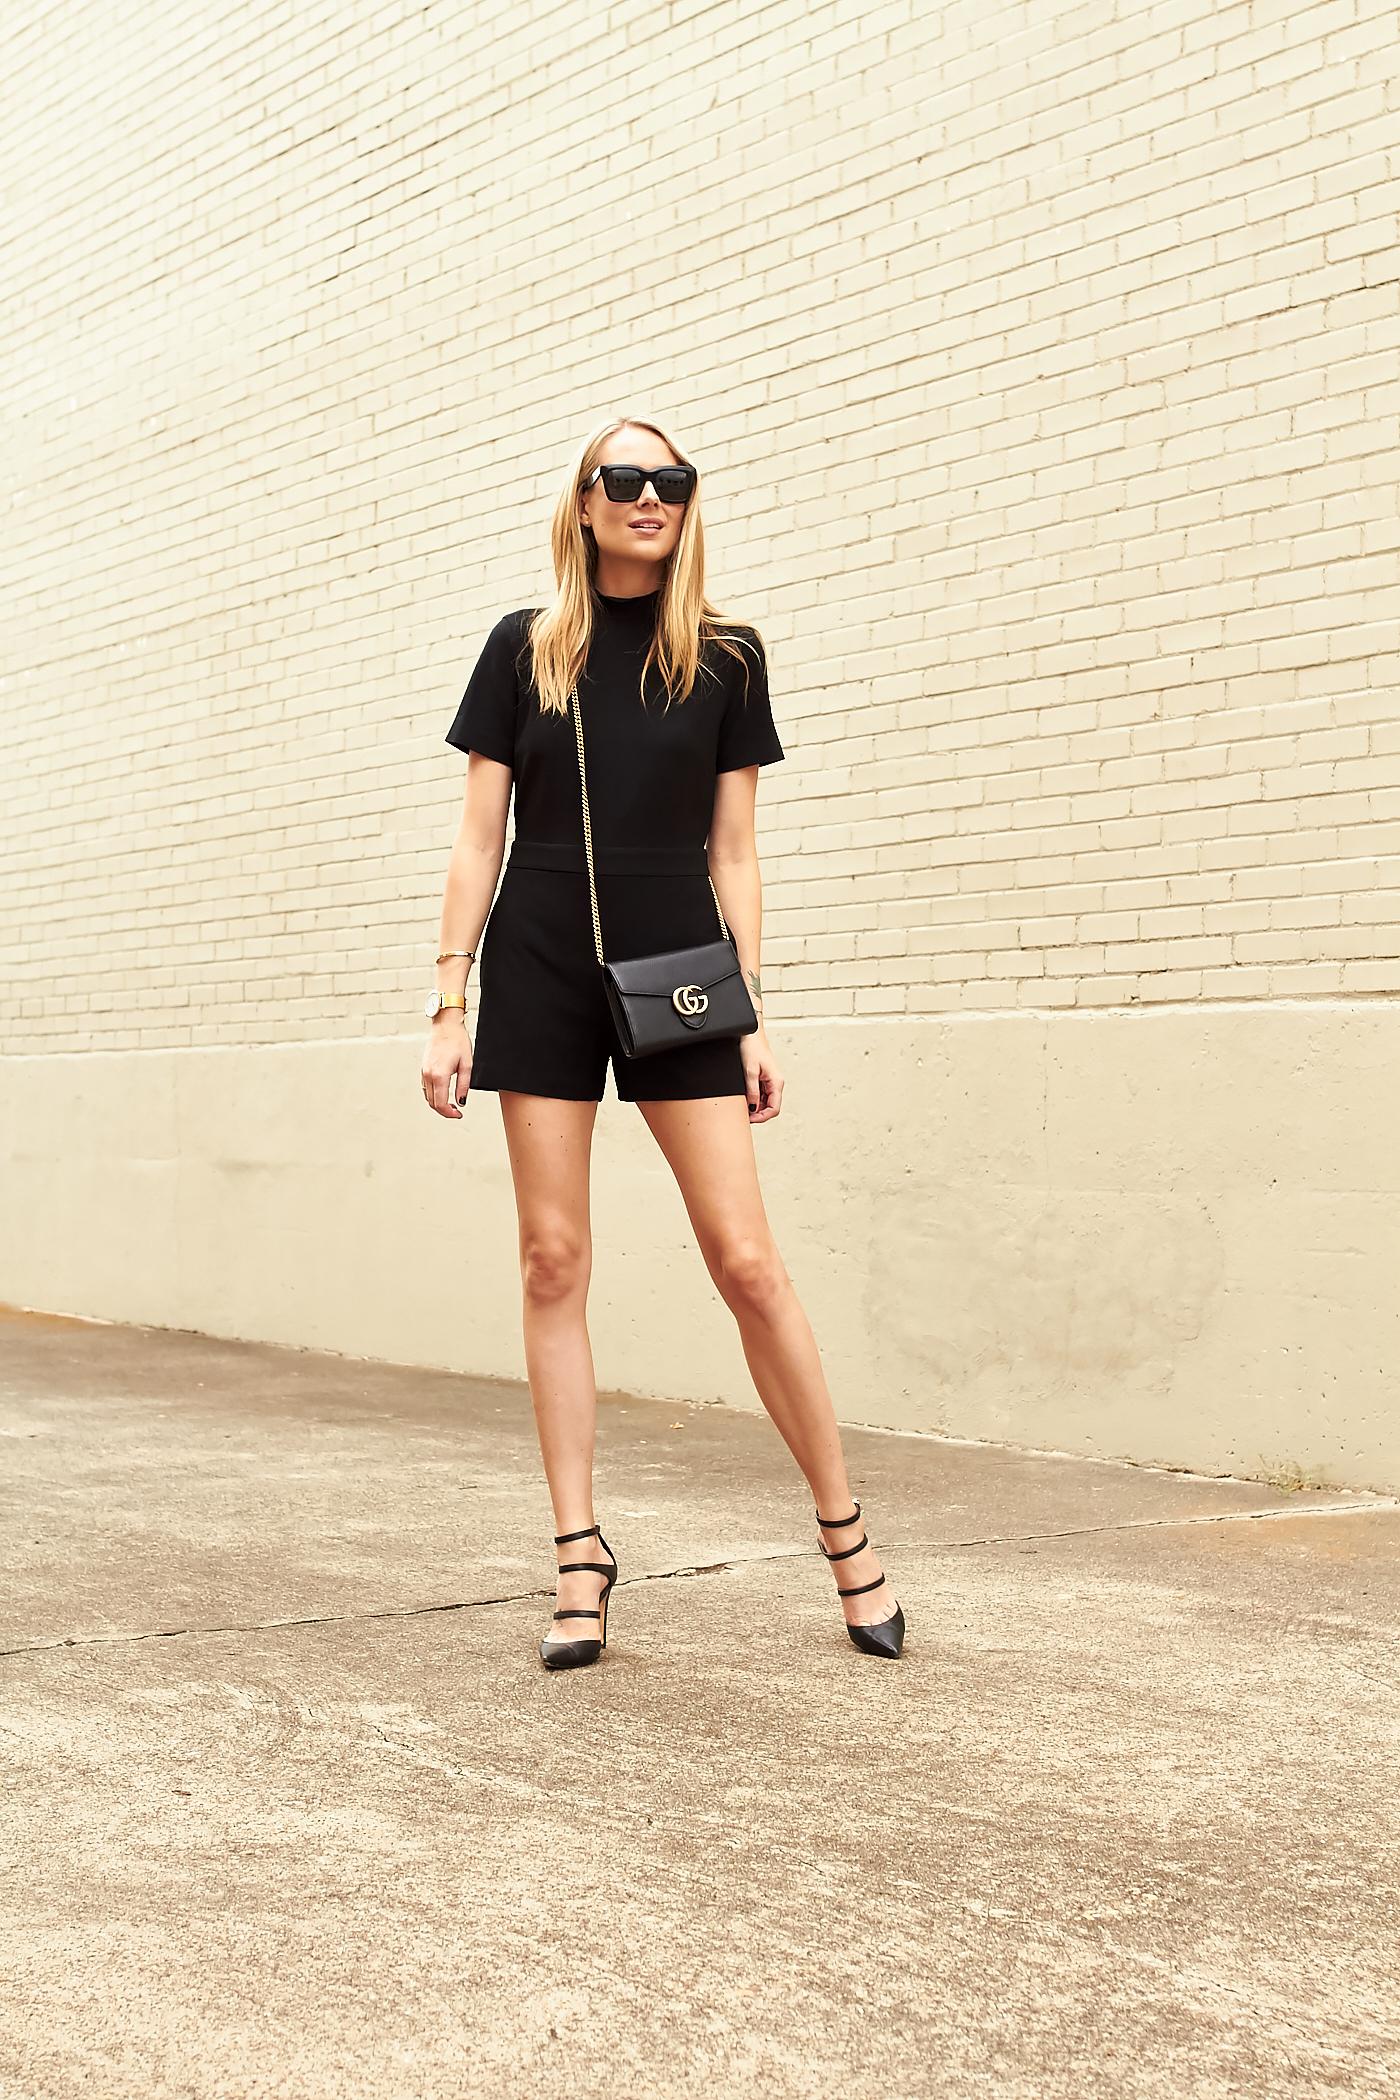 fashion-jackson-black-romper-black-gucci-marmont-handbag-black-strappy-pumps